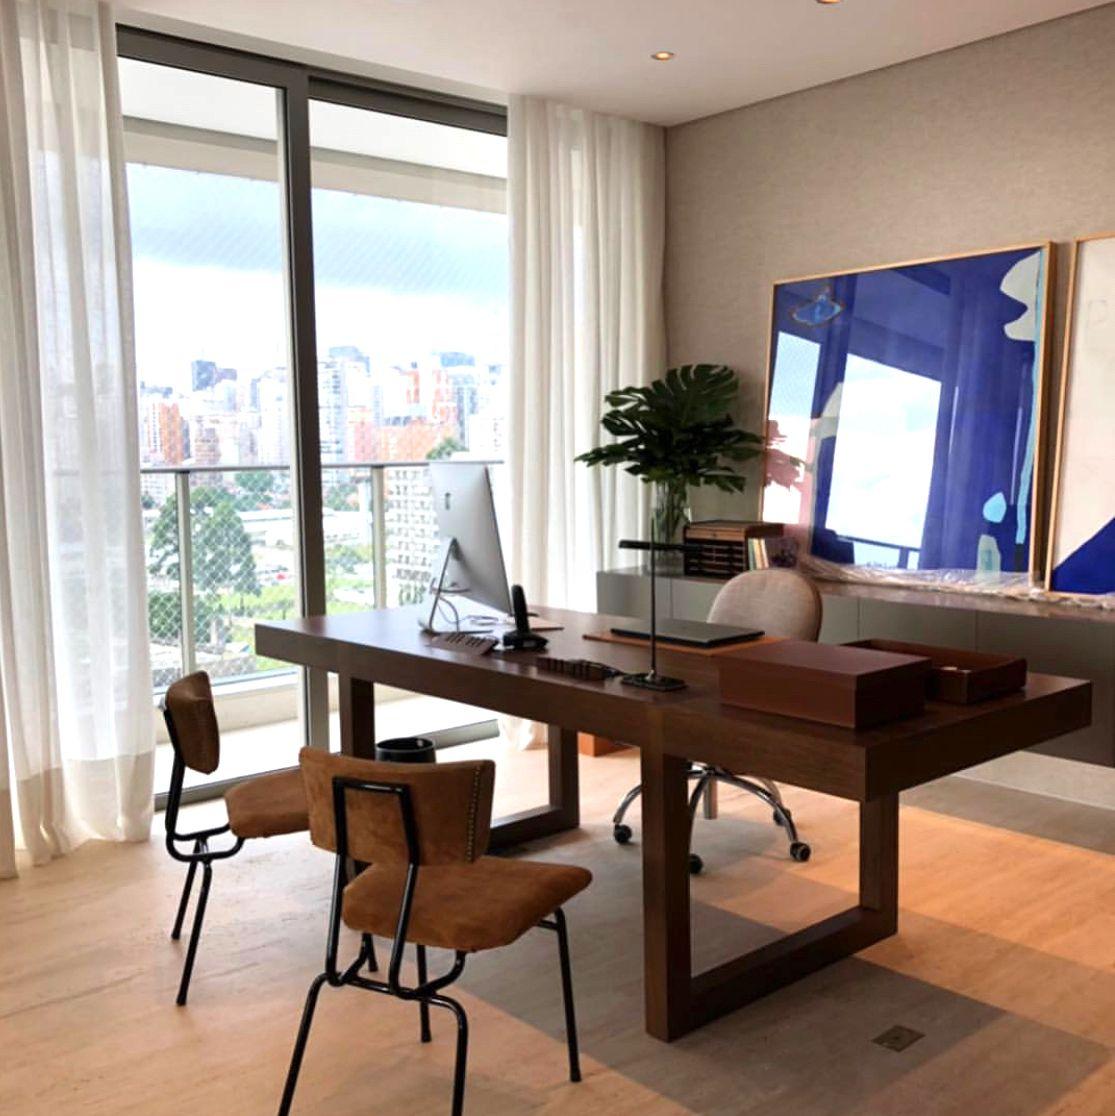 Vogel Desk By Etel Carmona Available At ESPASSO